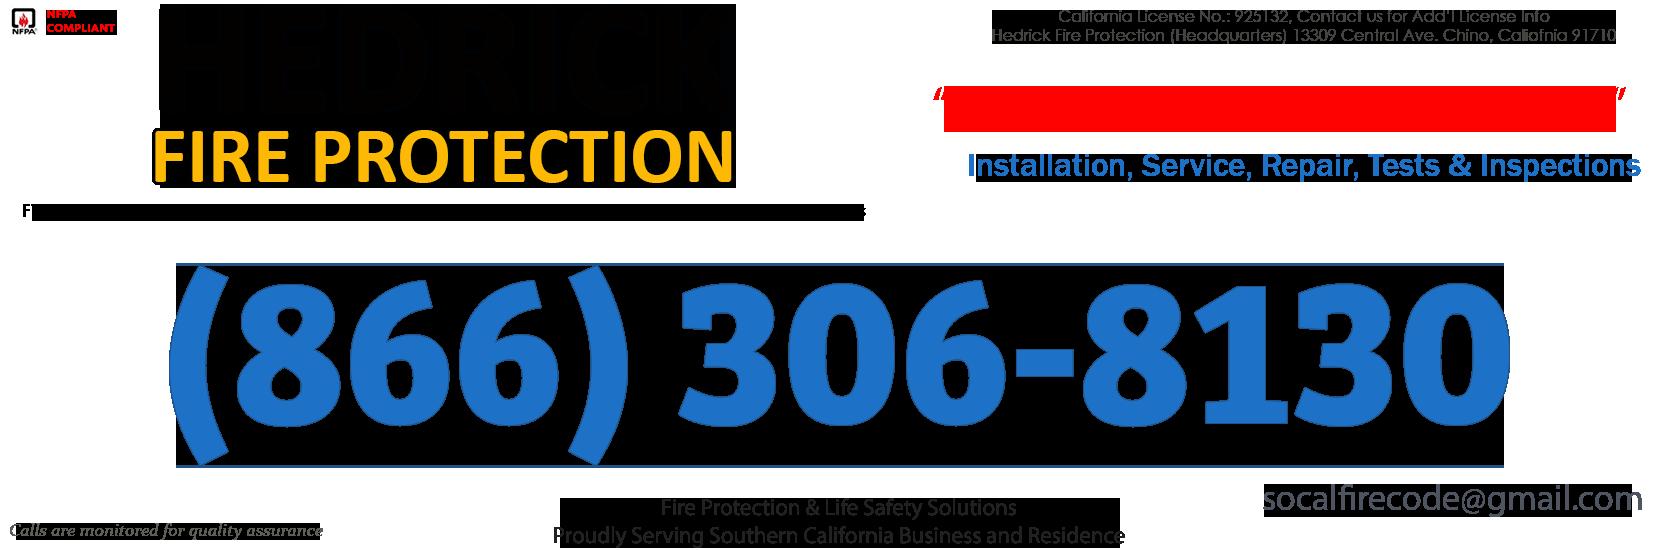 Chatsworth, California Fire Sprinkler Service Company